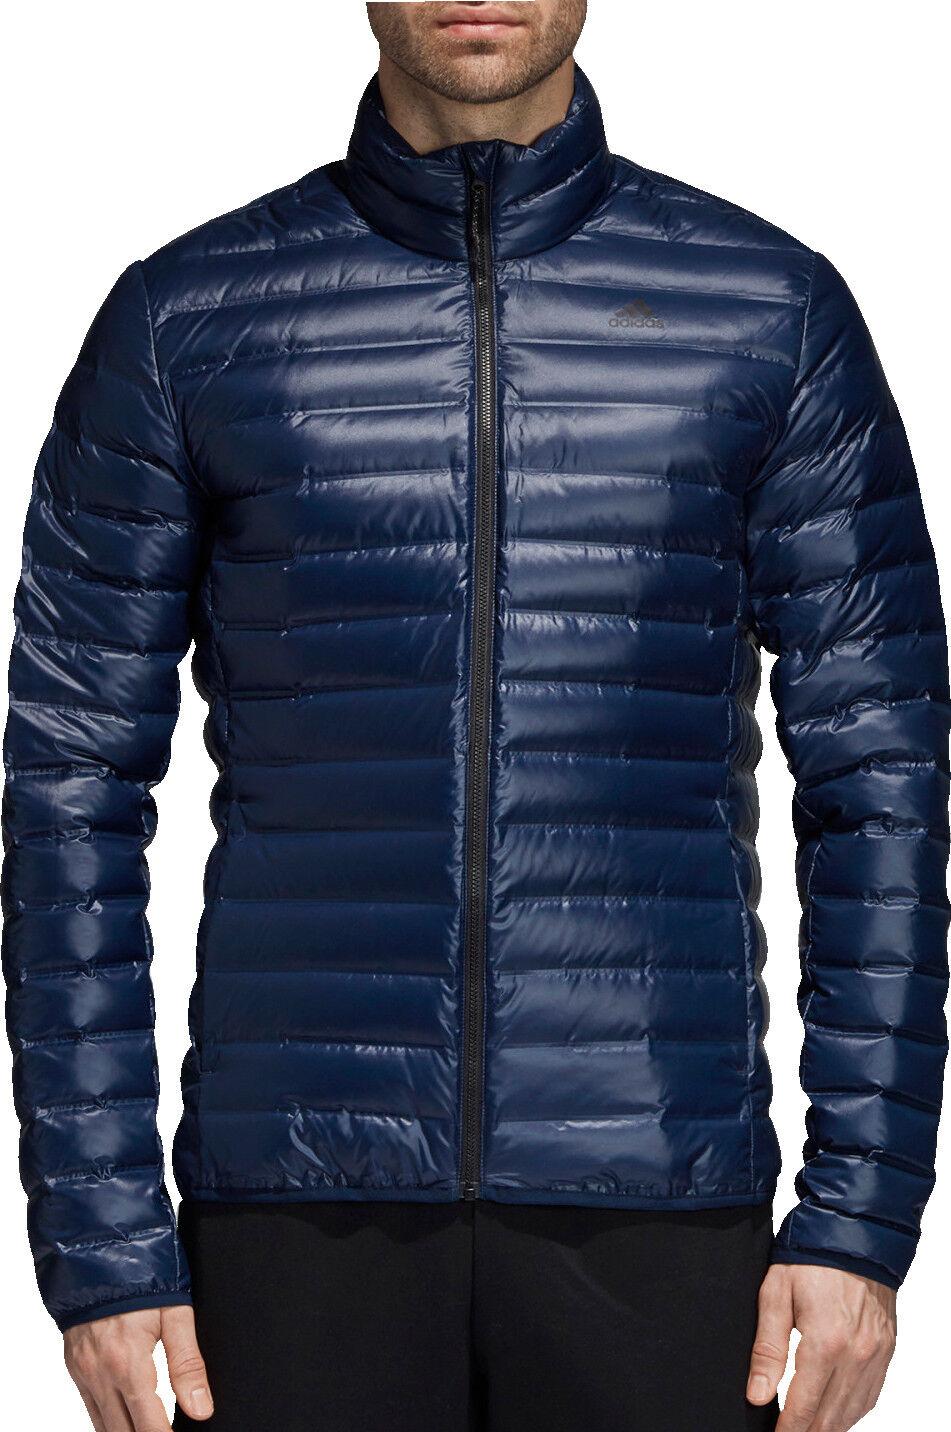 Adidas Varilite Mens Down Jacket - Blau